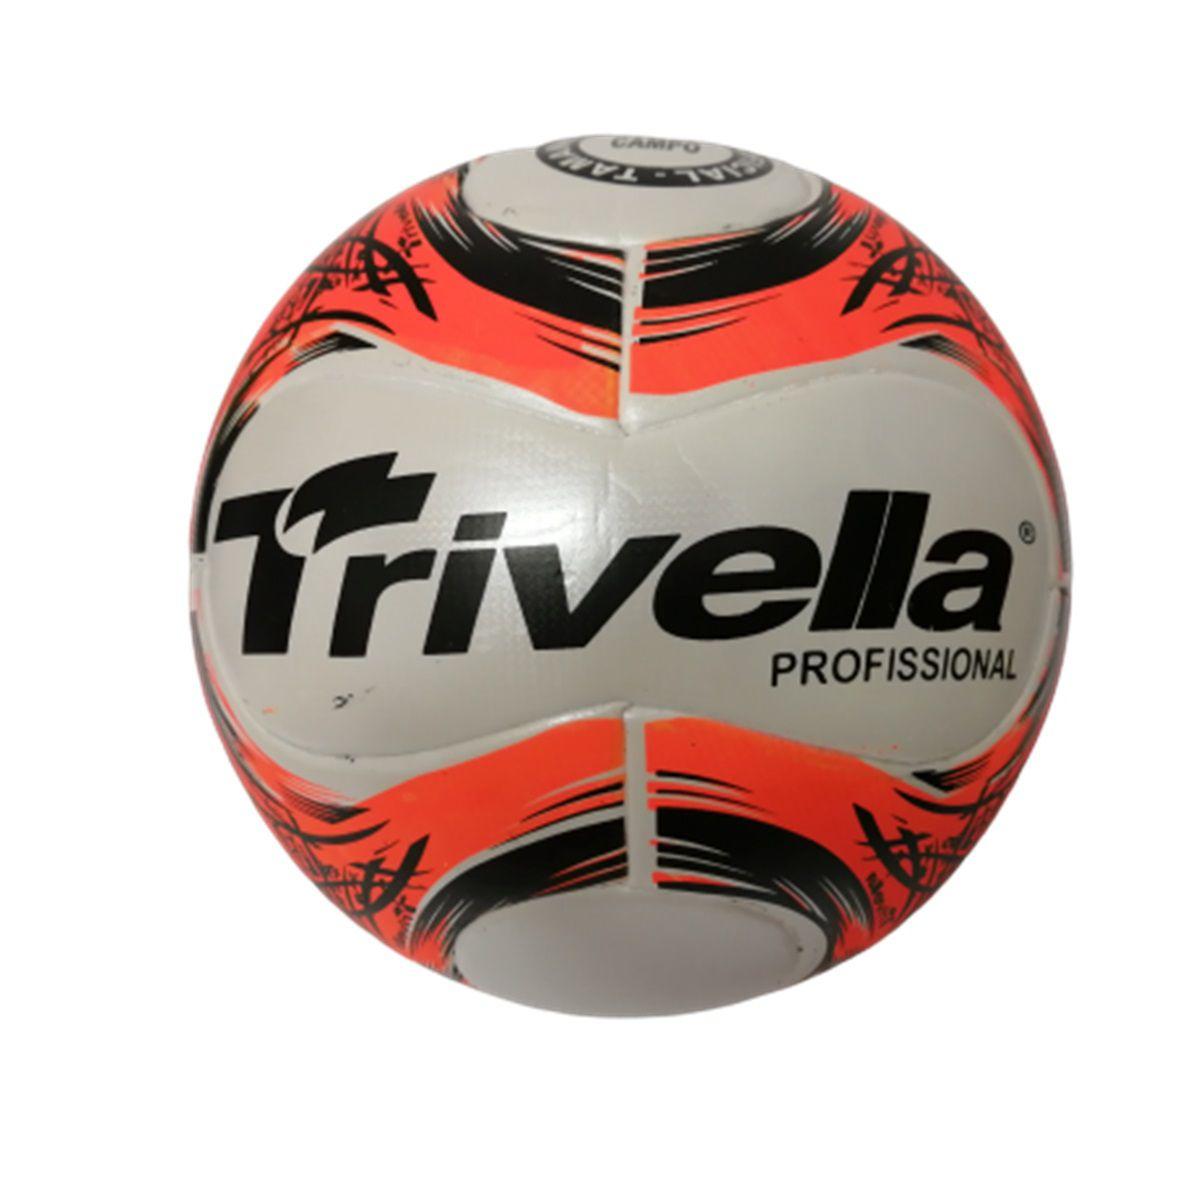 Kit C/ 6 Bolas Campo Trivella 100% PU Profissional